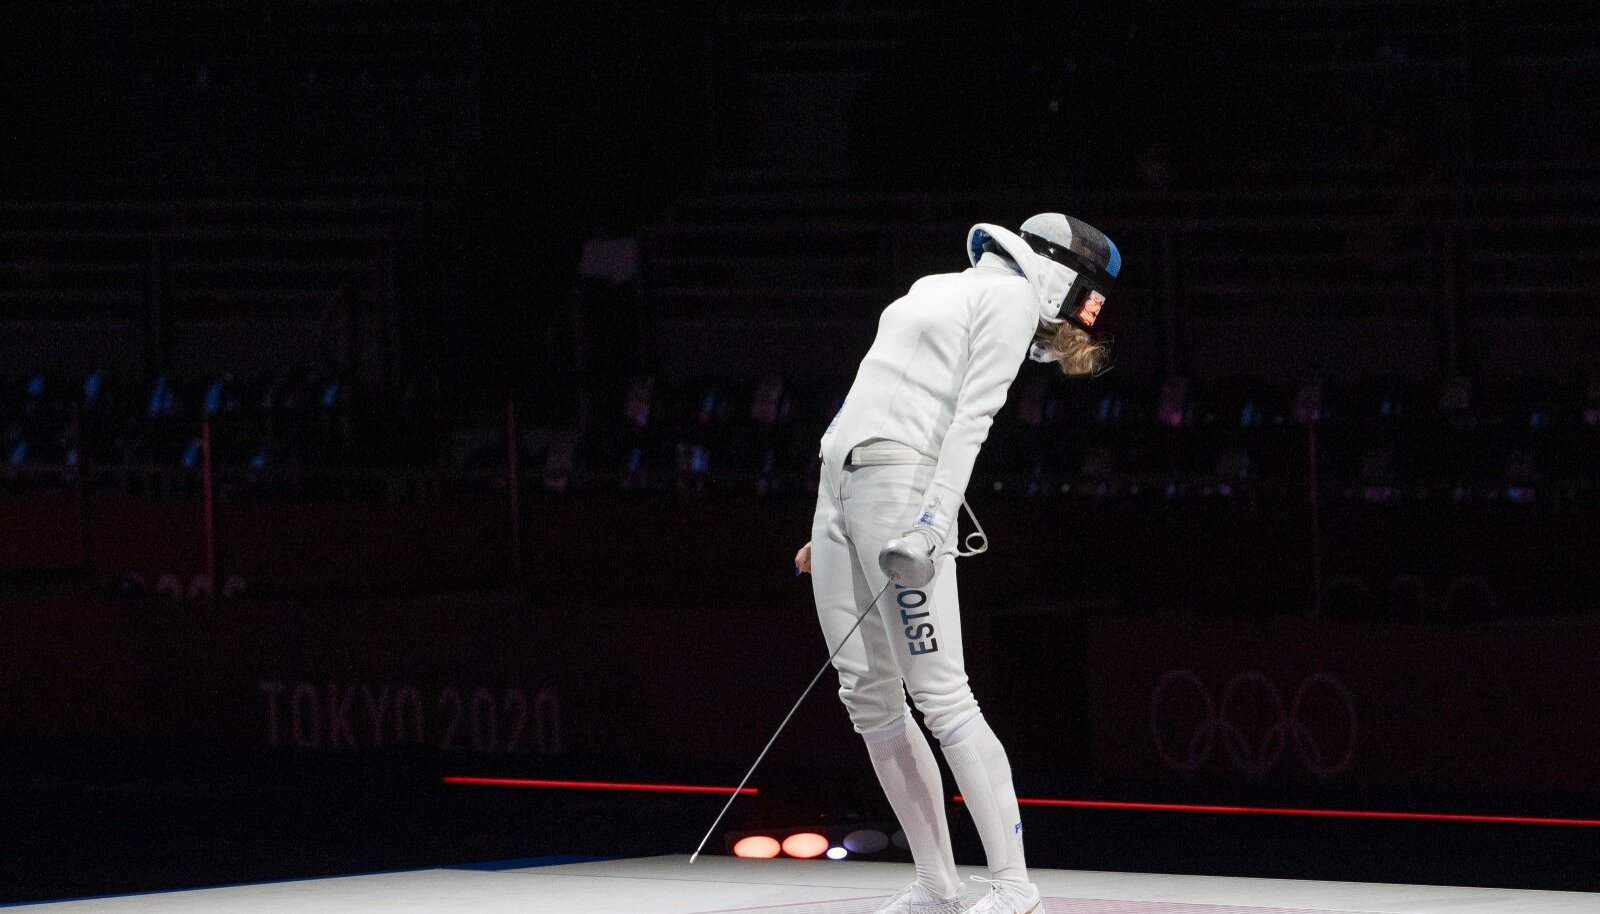 Katrina Lehis võitis Tokyo olümpial pronksmedali